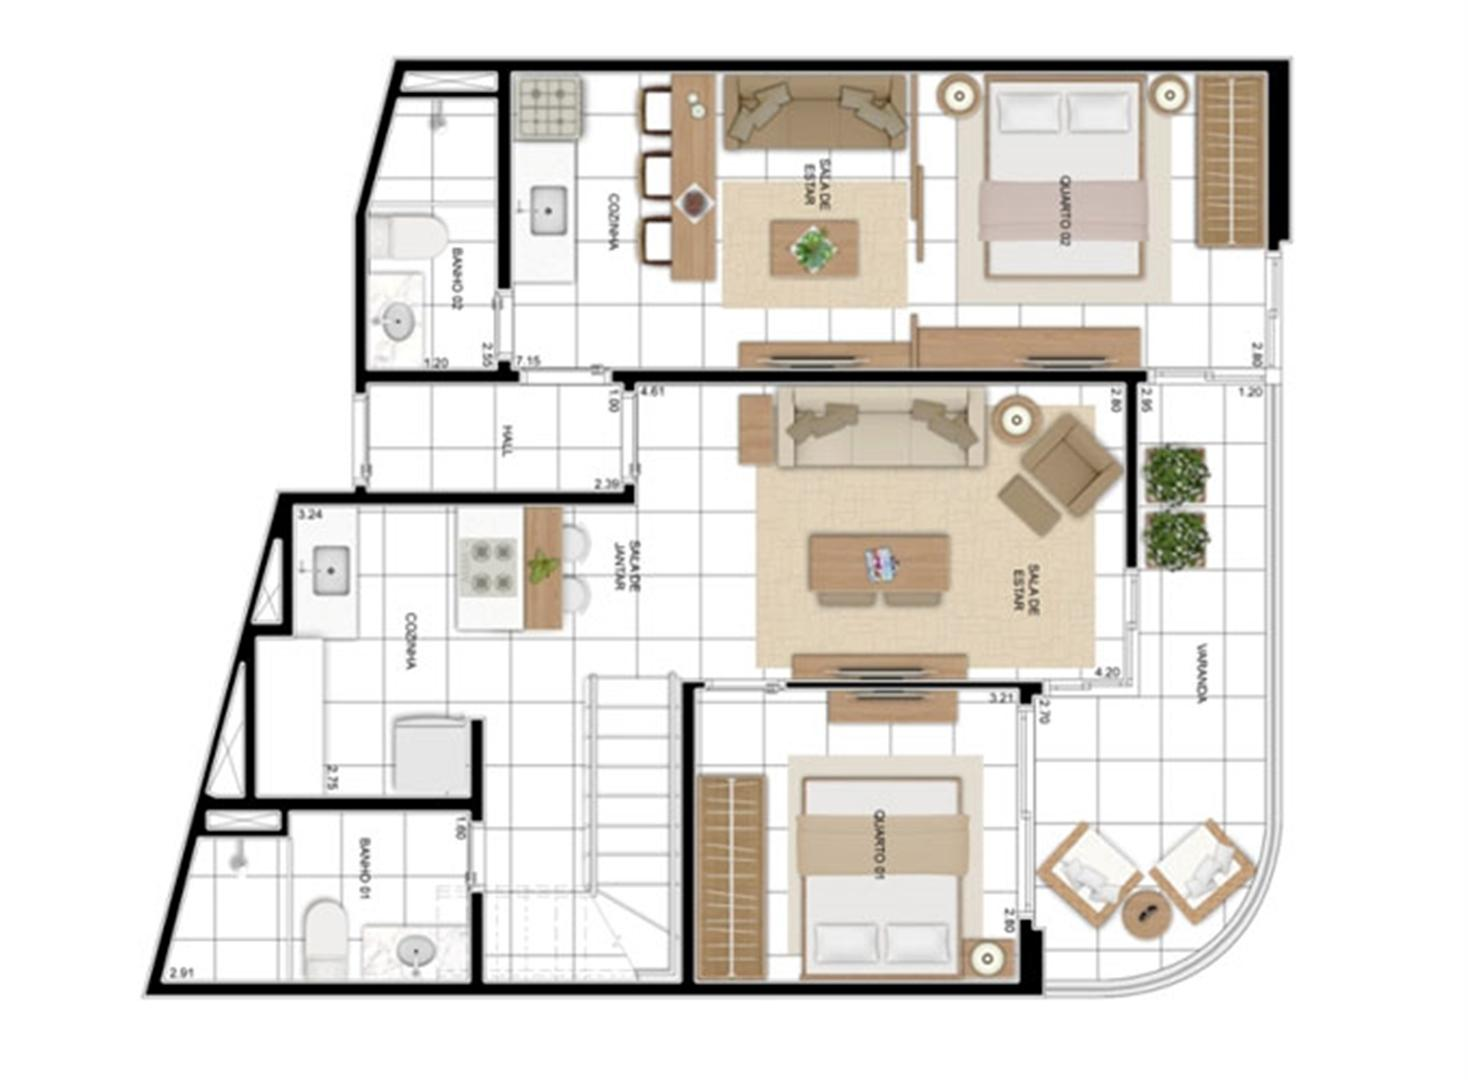 PLANTA - APTO TIPO A - 166 m² DUPLEX INFERIOR  | In Mare Bali – Apartamento no  Distrito Litoral de Cotovelo - Parnamirim - Rio Grande do Norte